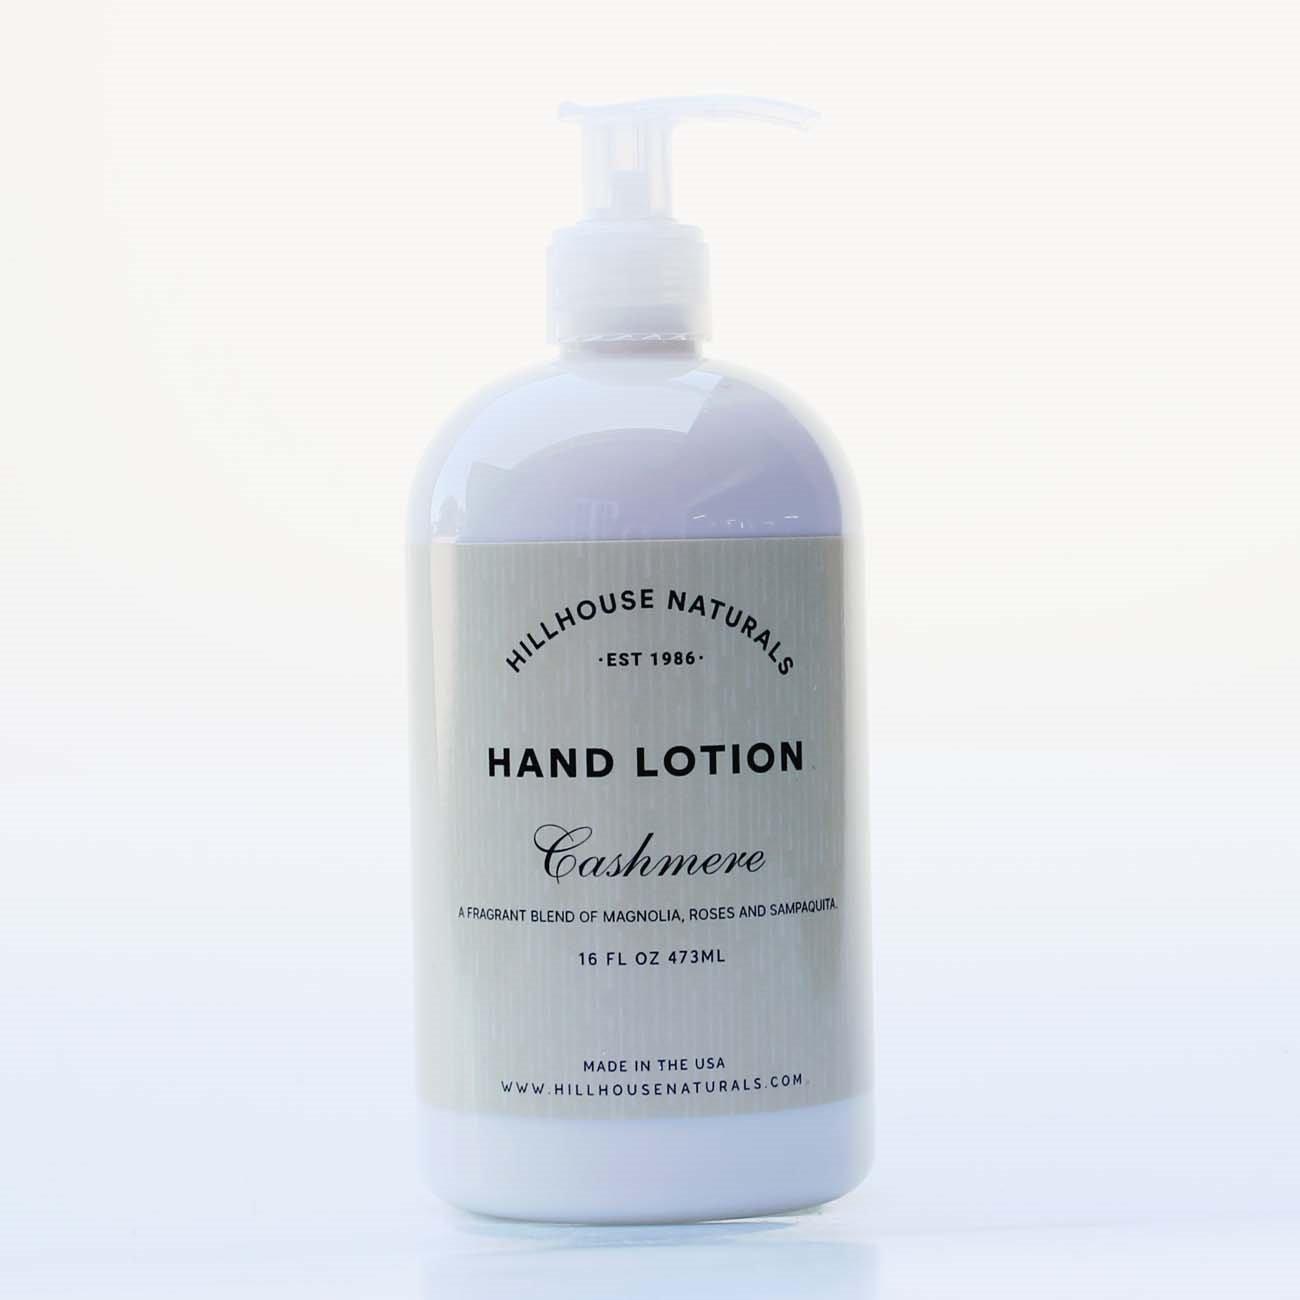 Cashmere Hand Lotion 8.25 oz by Hillhouse Naturals